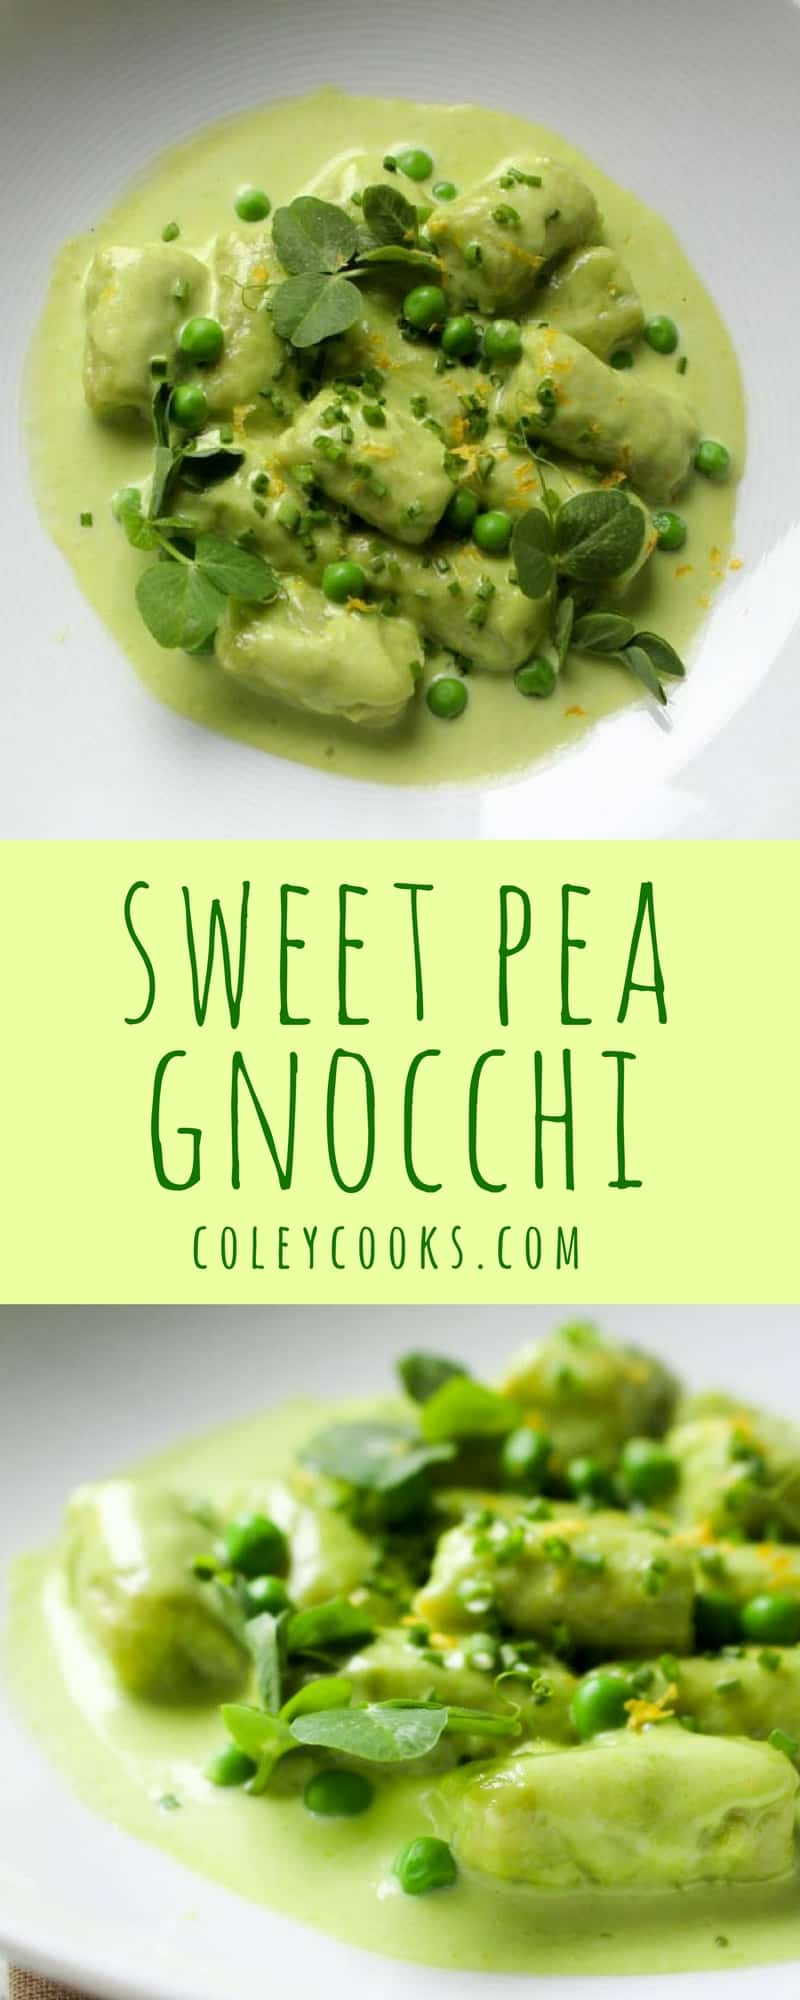 SWEET PEA GNOCCHI with Tarragon Pea Cream   A Beautiful Spring Recipe   ColeyCooks.com